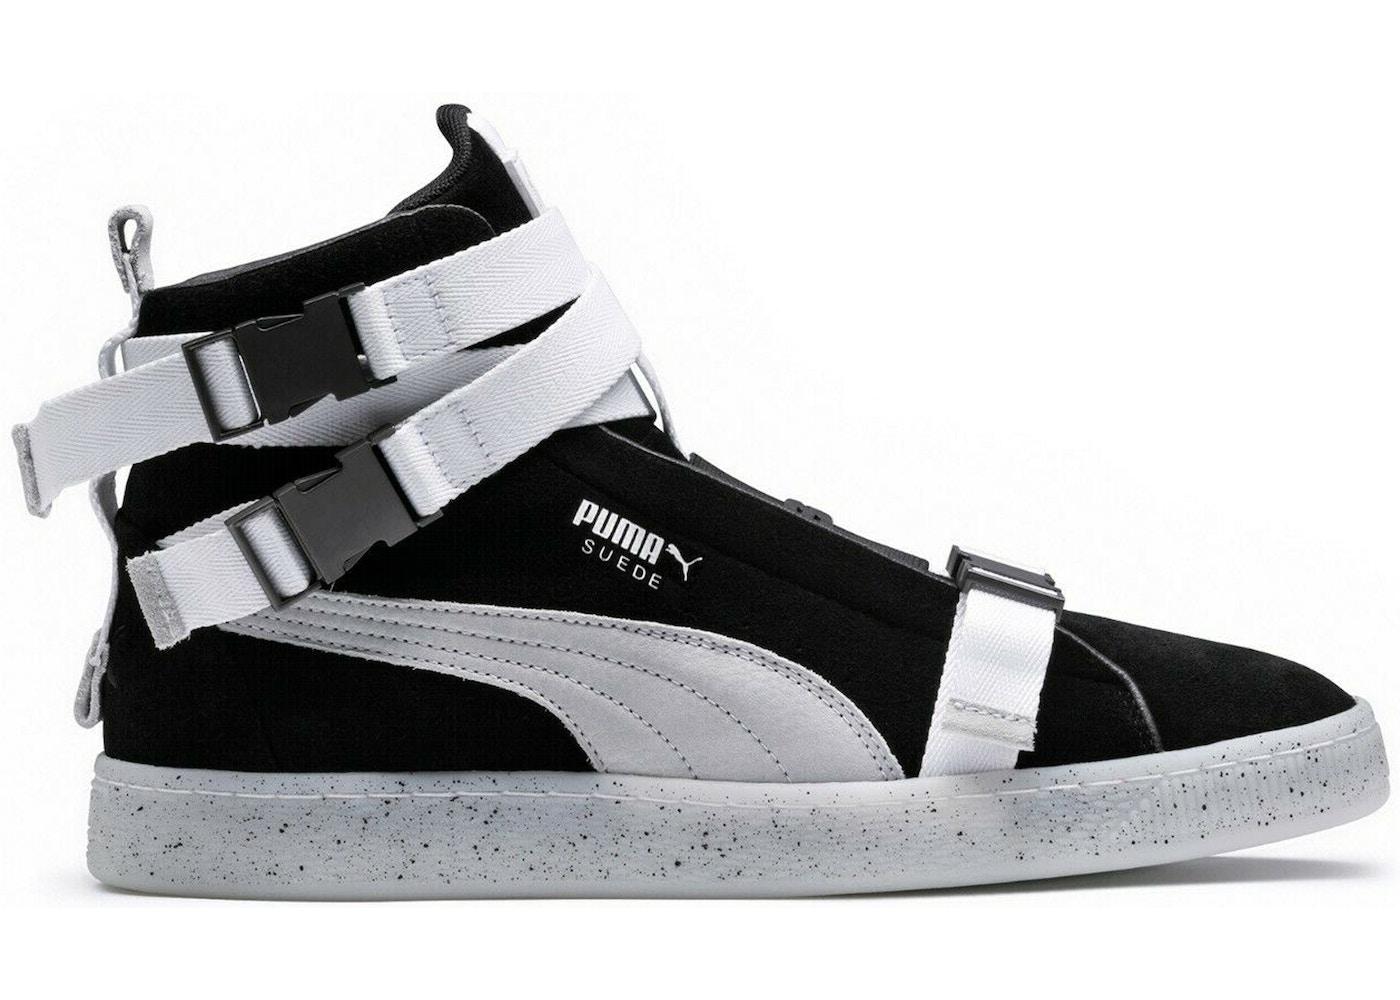 a065e128773af5 Puma Suede Classic The Weeknd Black White - 366310-03